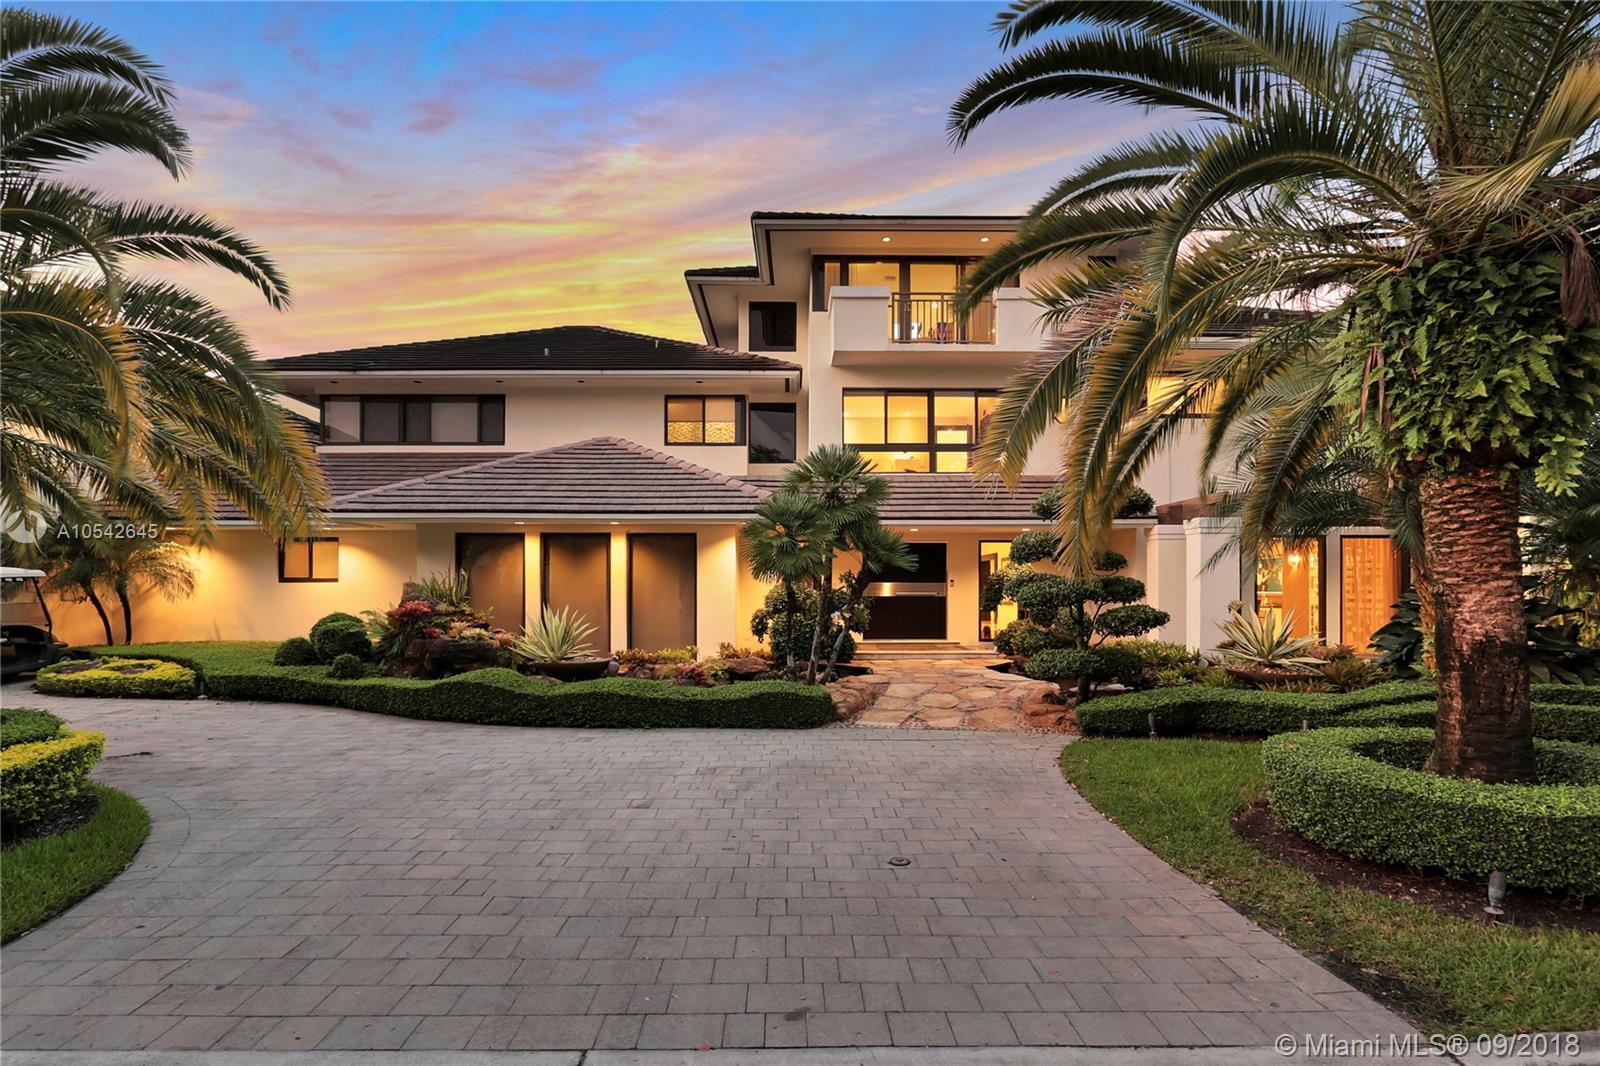 Property for sale at 9464 NW 52nd Doral Ln, Doral,  Florida 33178